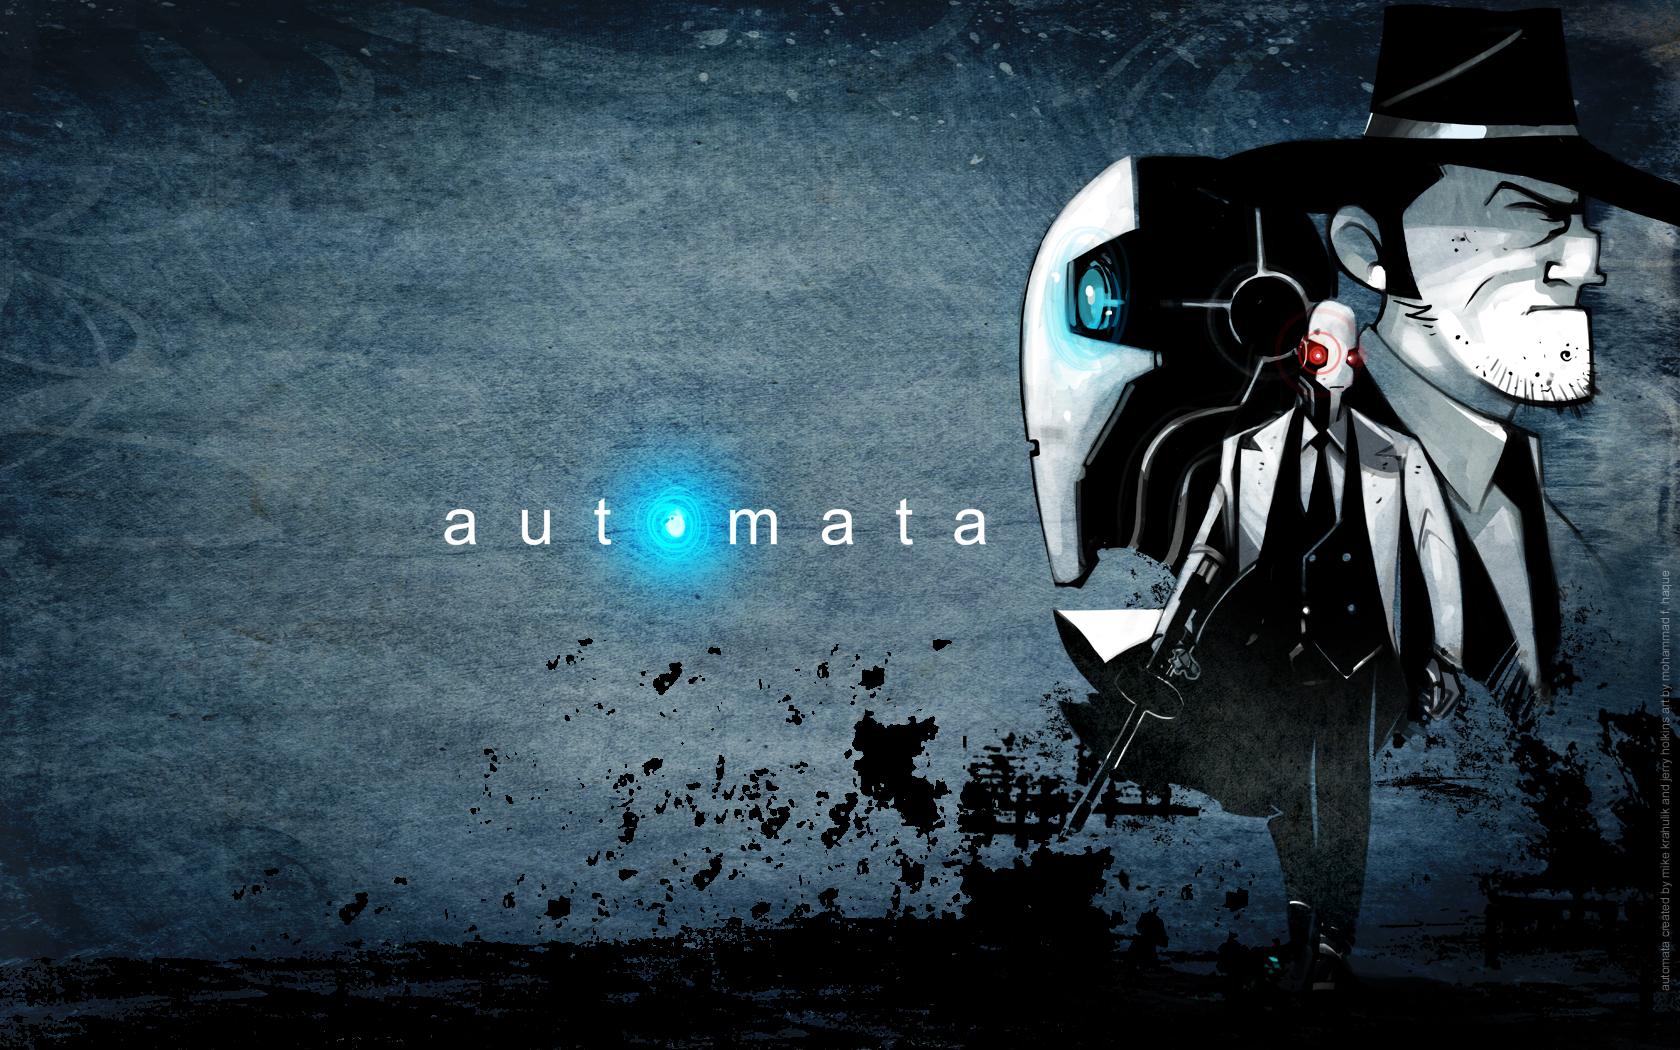 Anime Google Themes Automata Anime Google Wallpapers Automata Anime 1680x1050